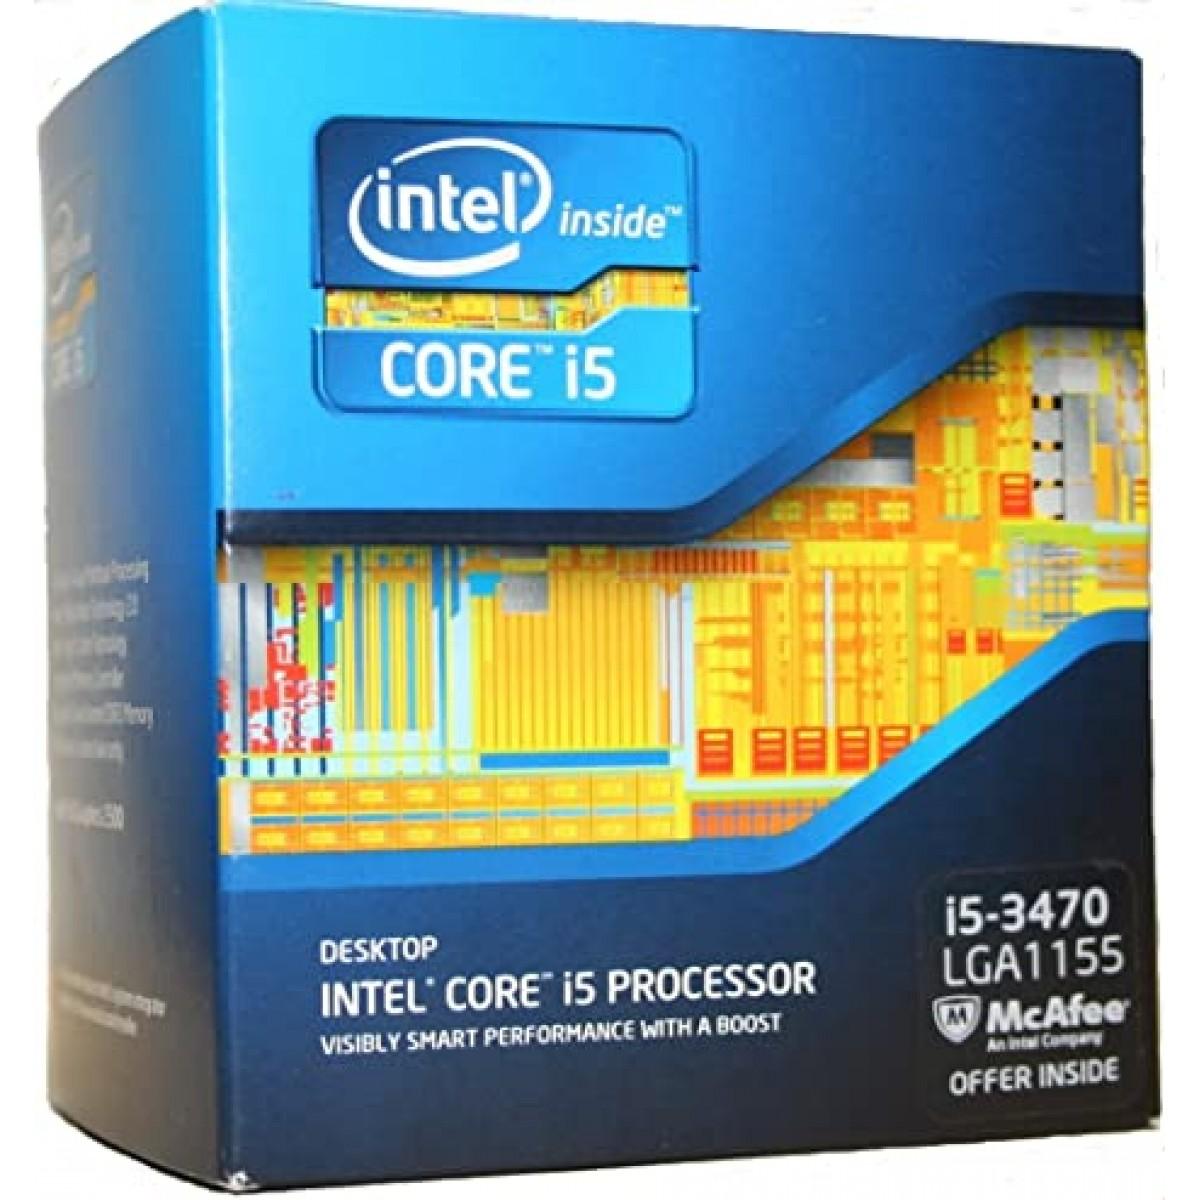 Processador Intel Core i5 3470 3.20GHz (3.60GHz Turbo), 6MB, 4-Cores 4-Threads, LGA 1155